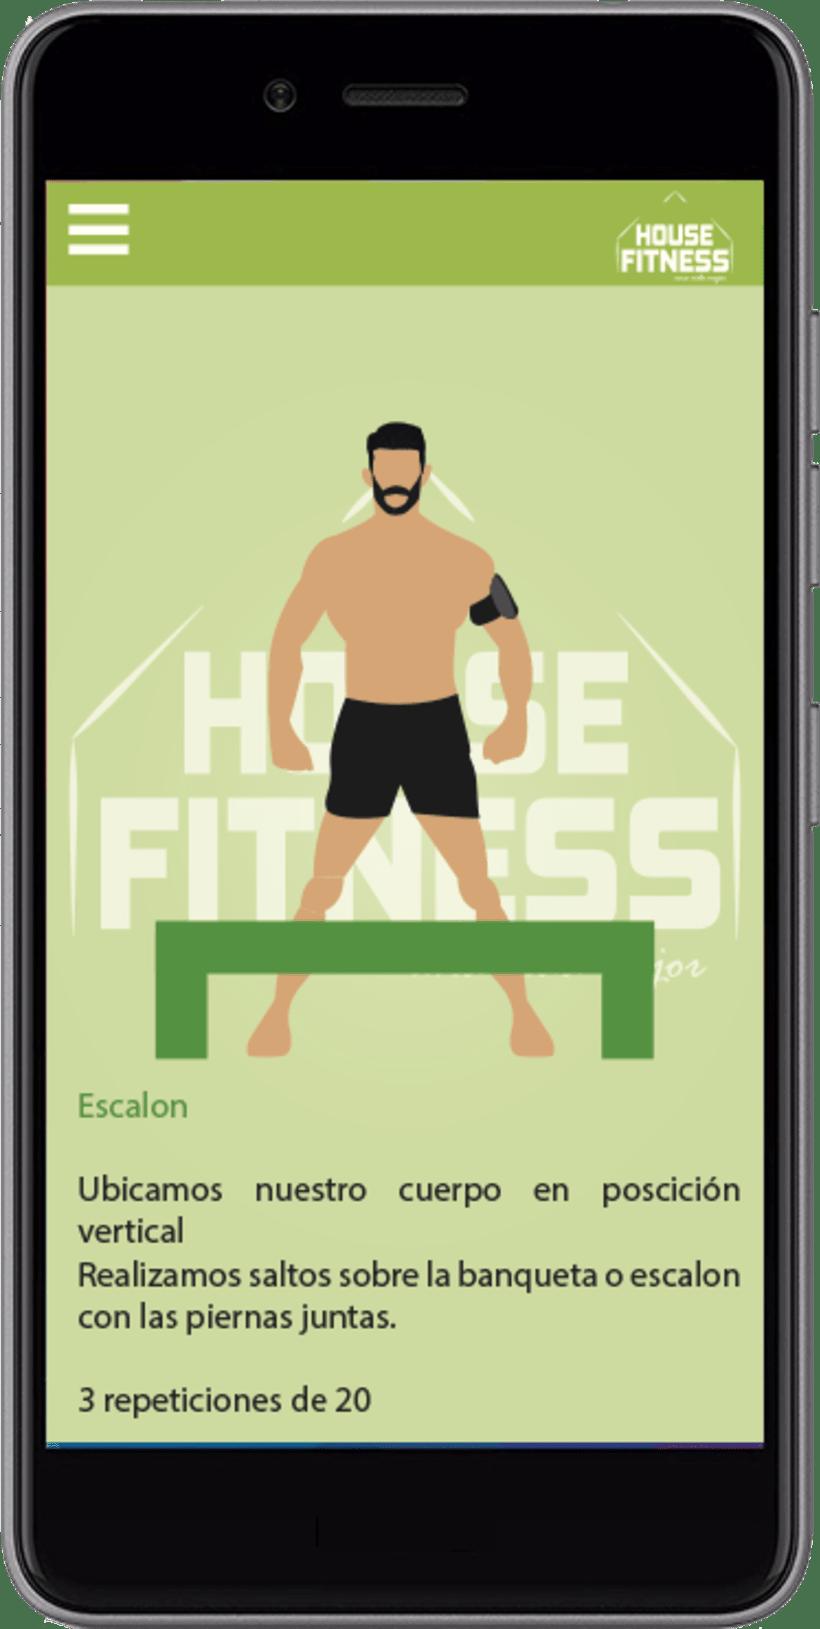 Desarollo de App House Fitness 5